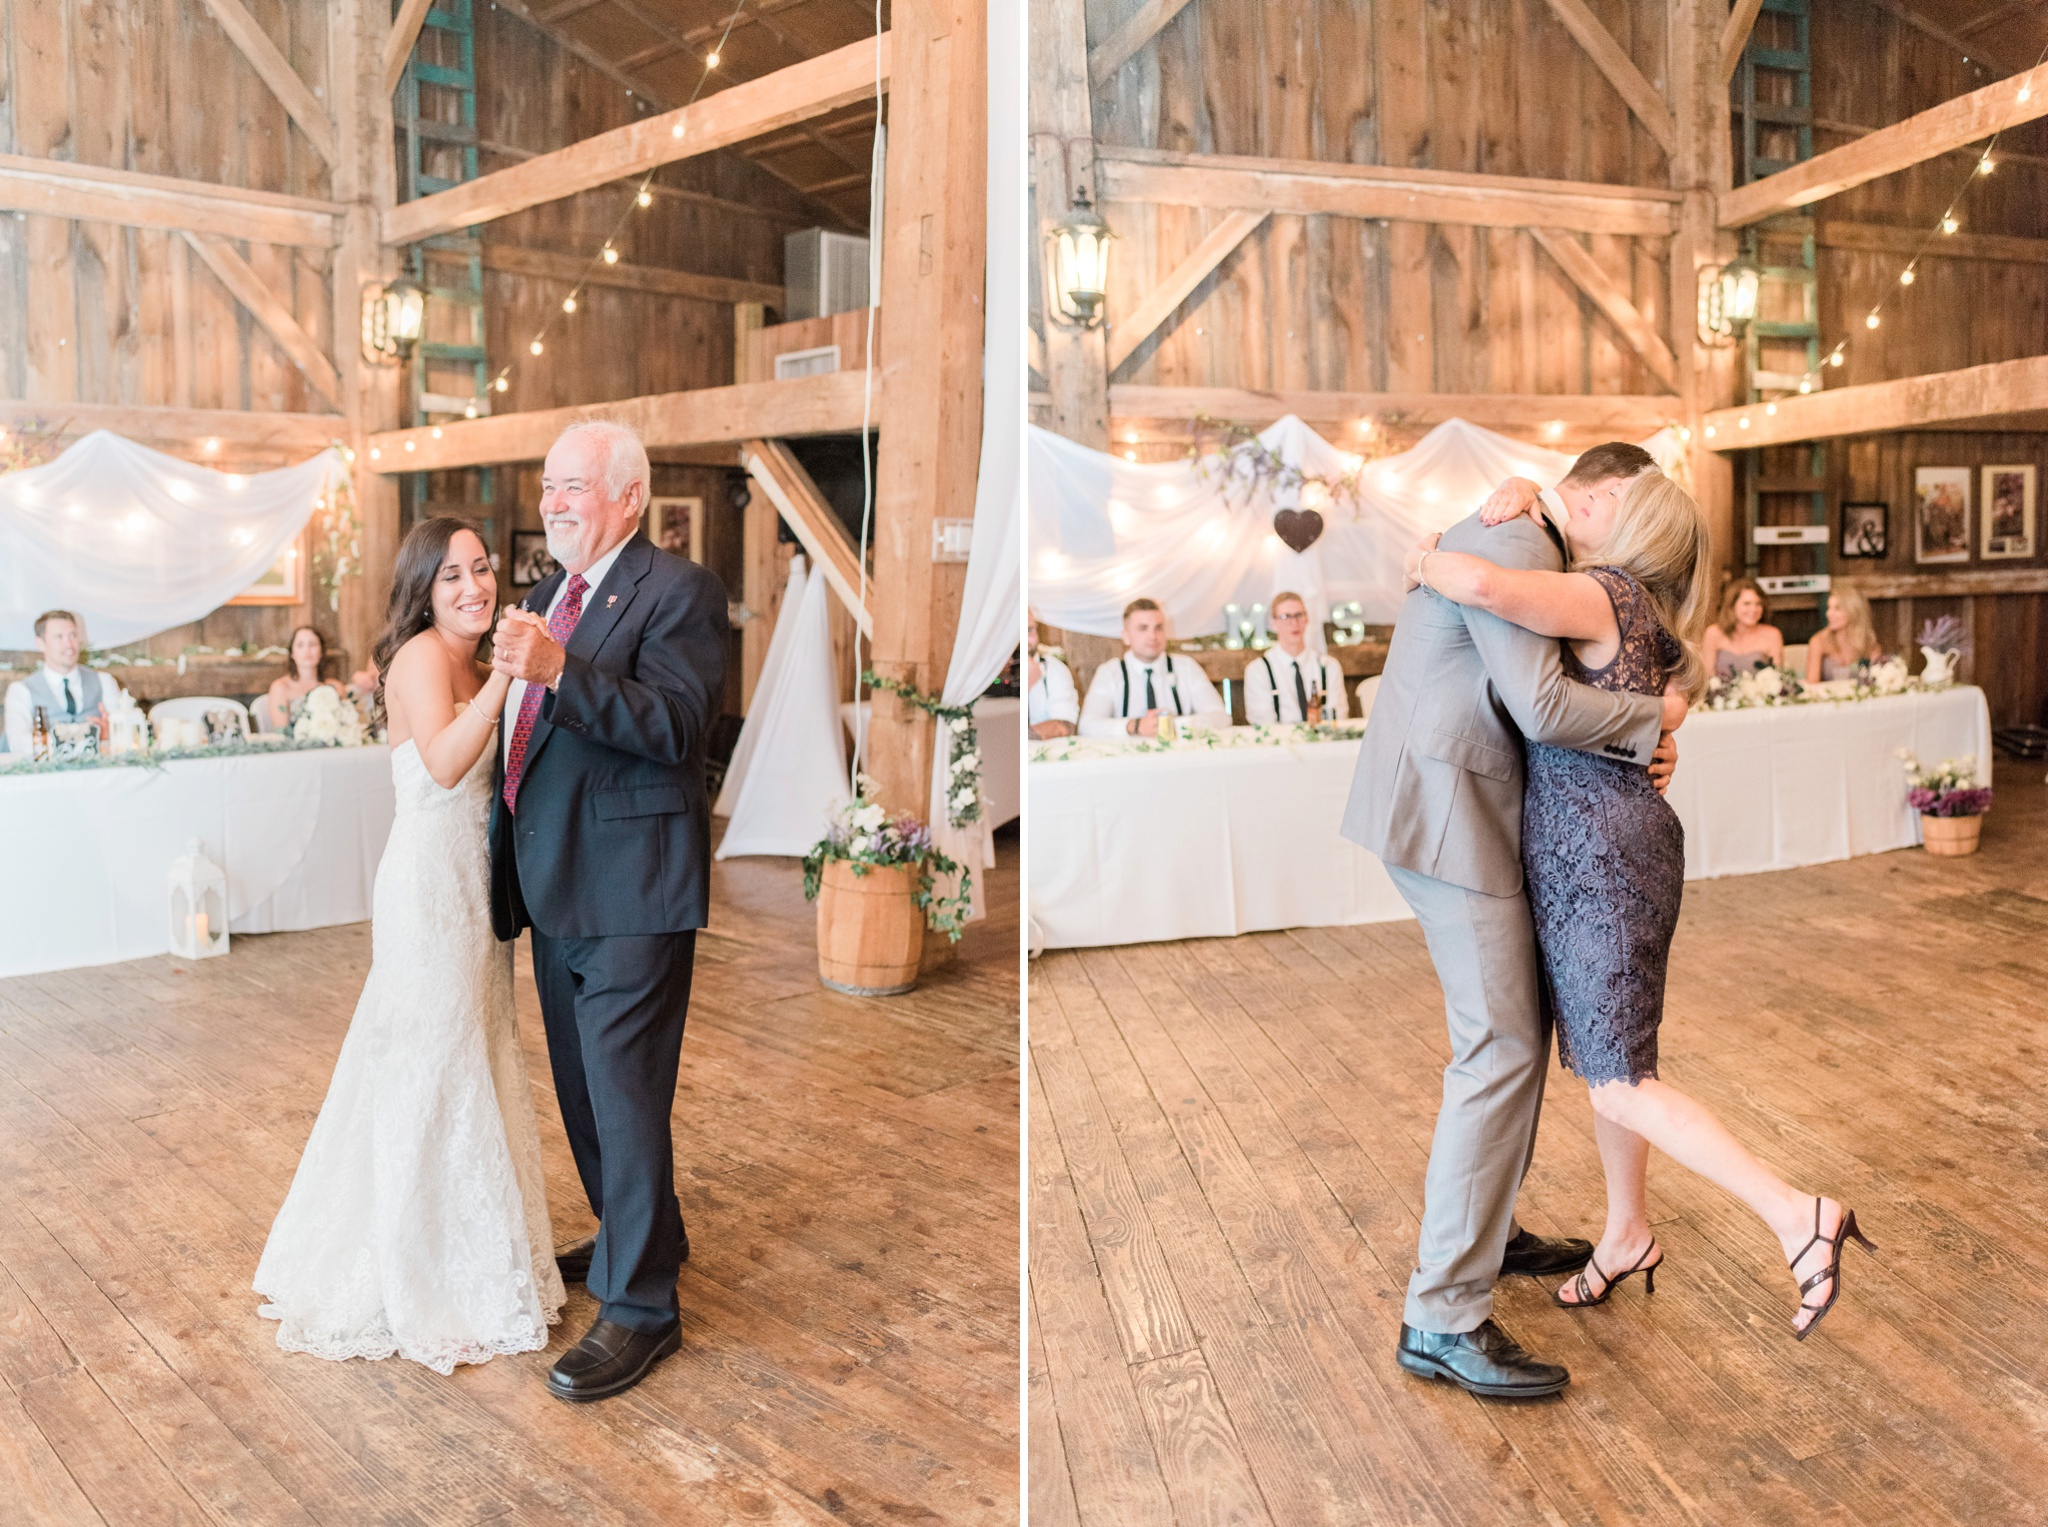 niederman-farm-wedding-cincinnati-ohio-photographer_0100.jpg